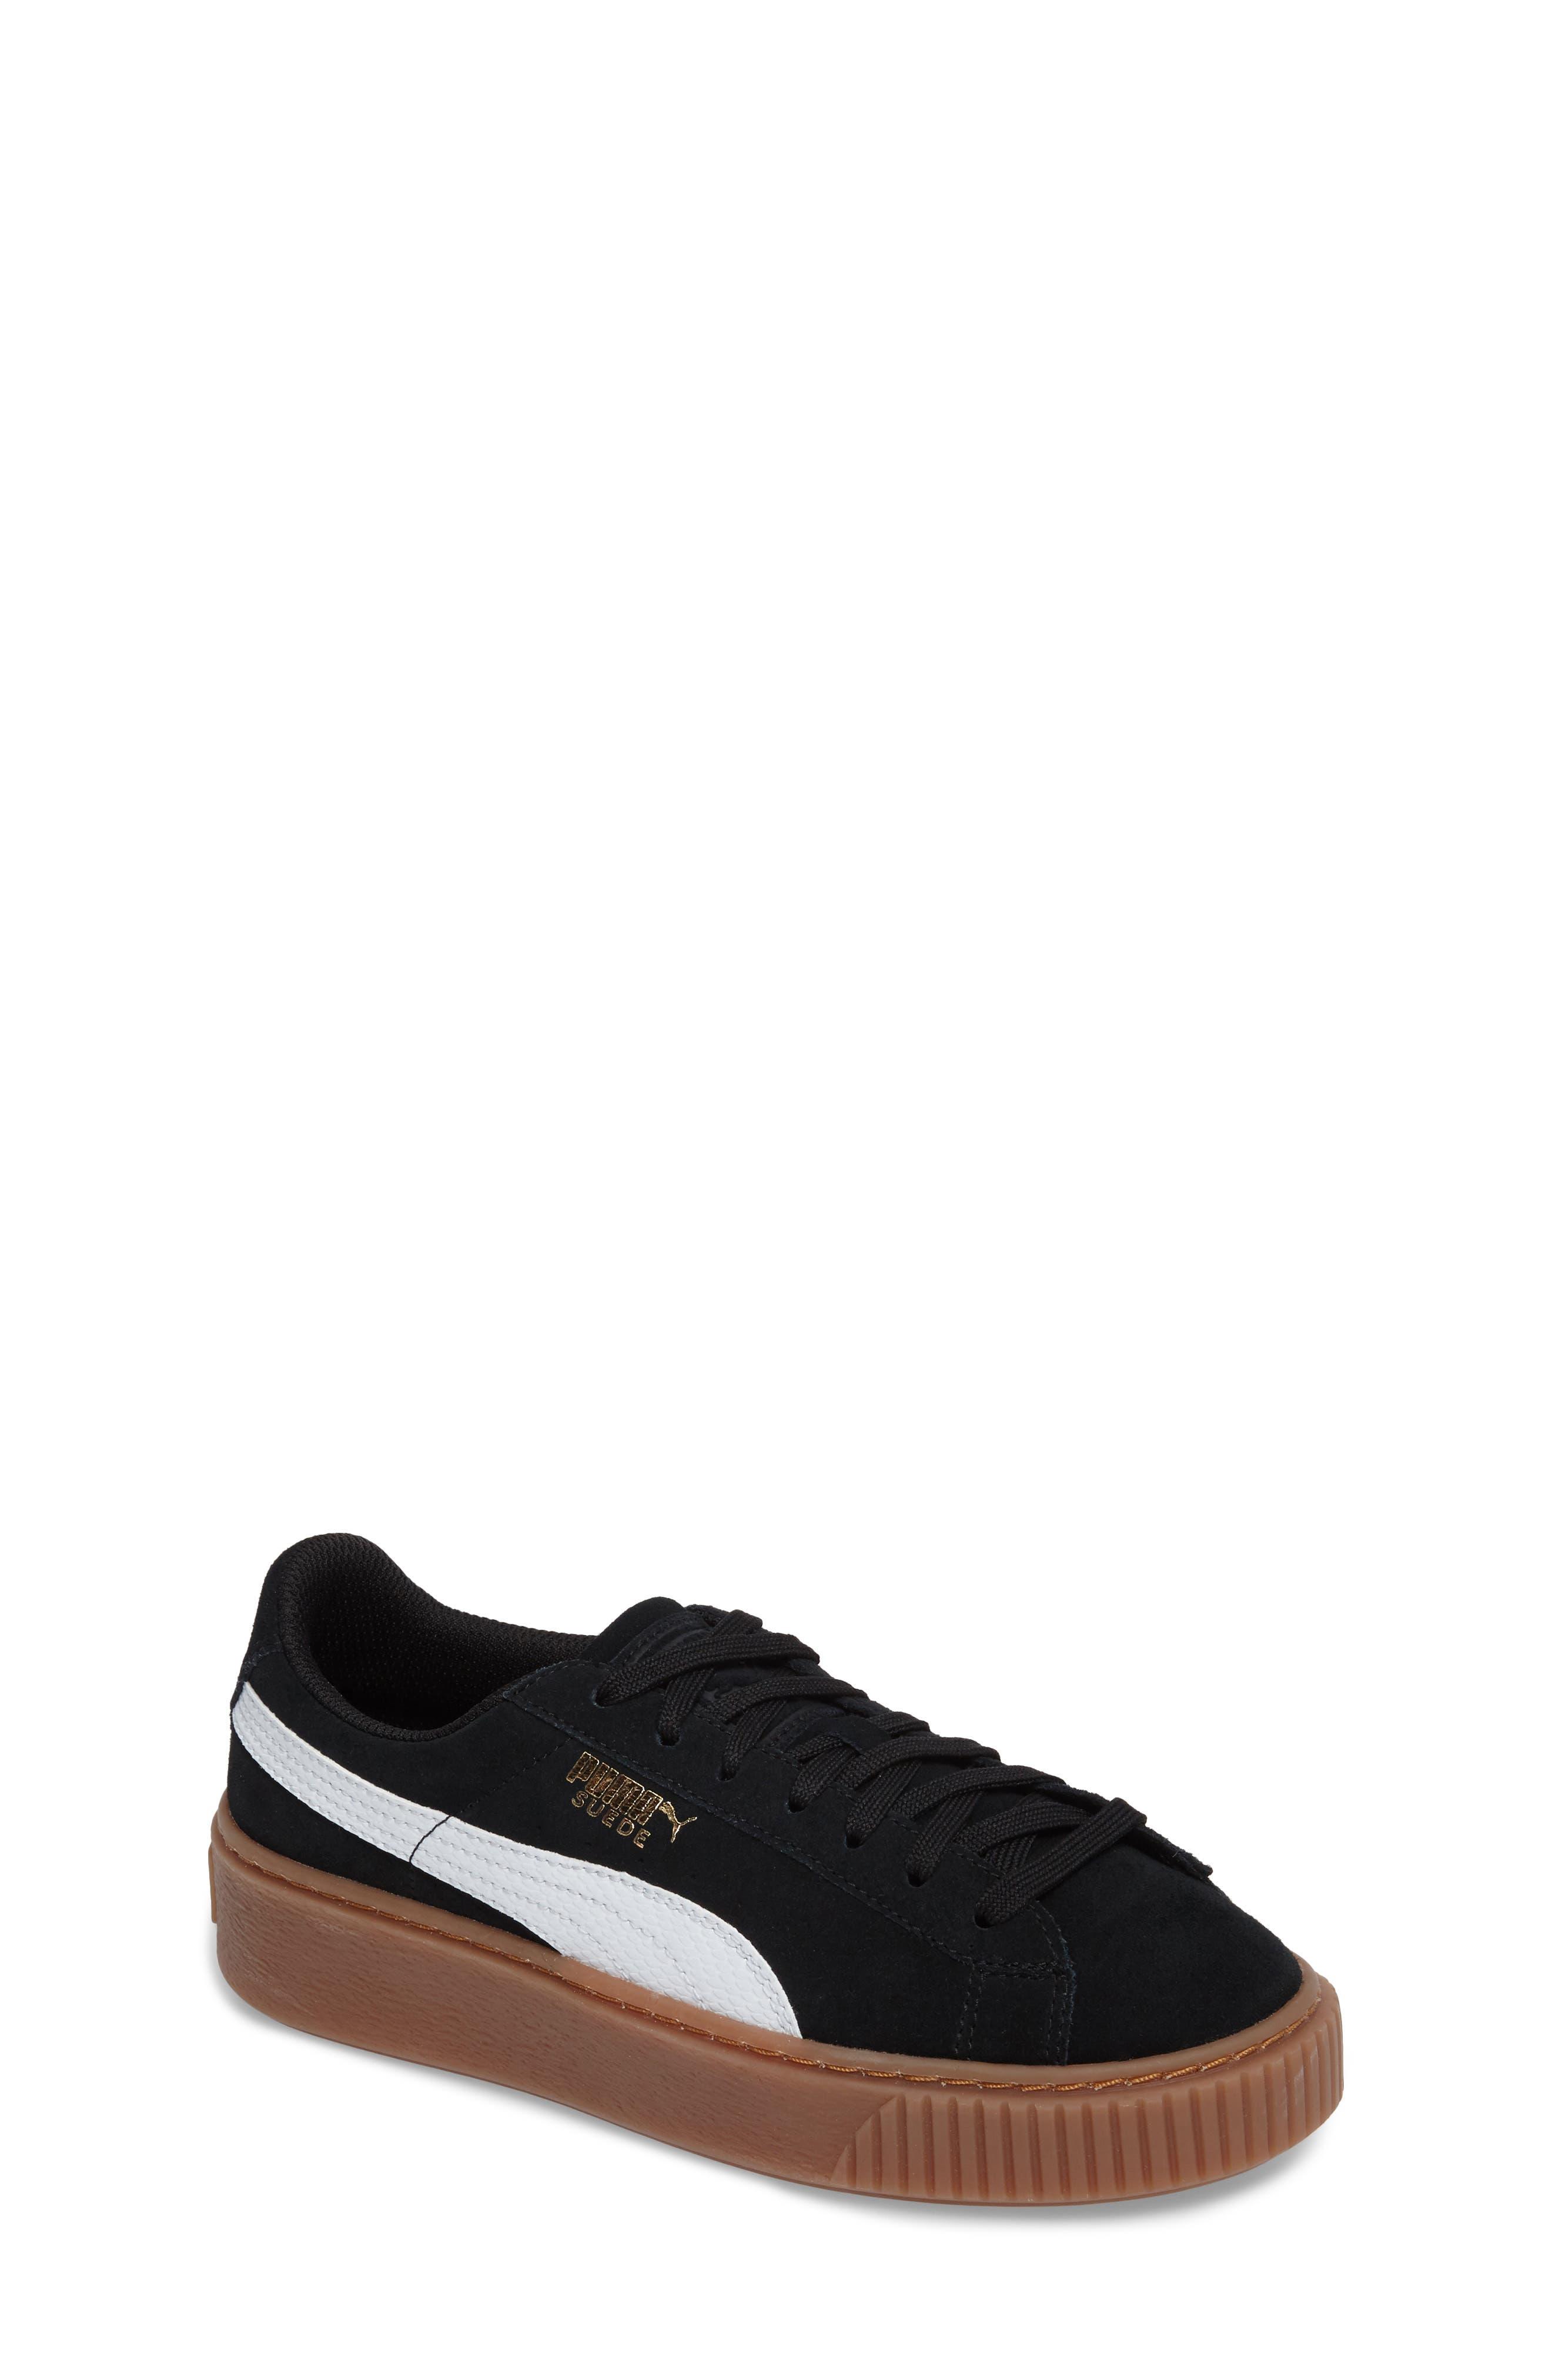 PUMA Suede Platform Jr Sneaker (Big Kid)